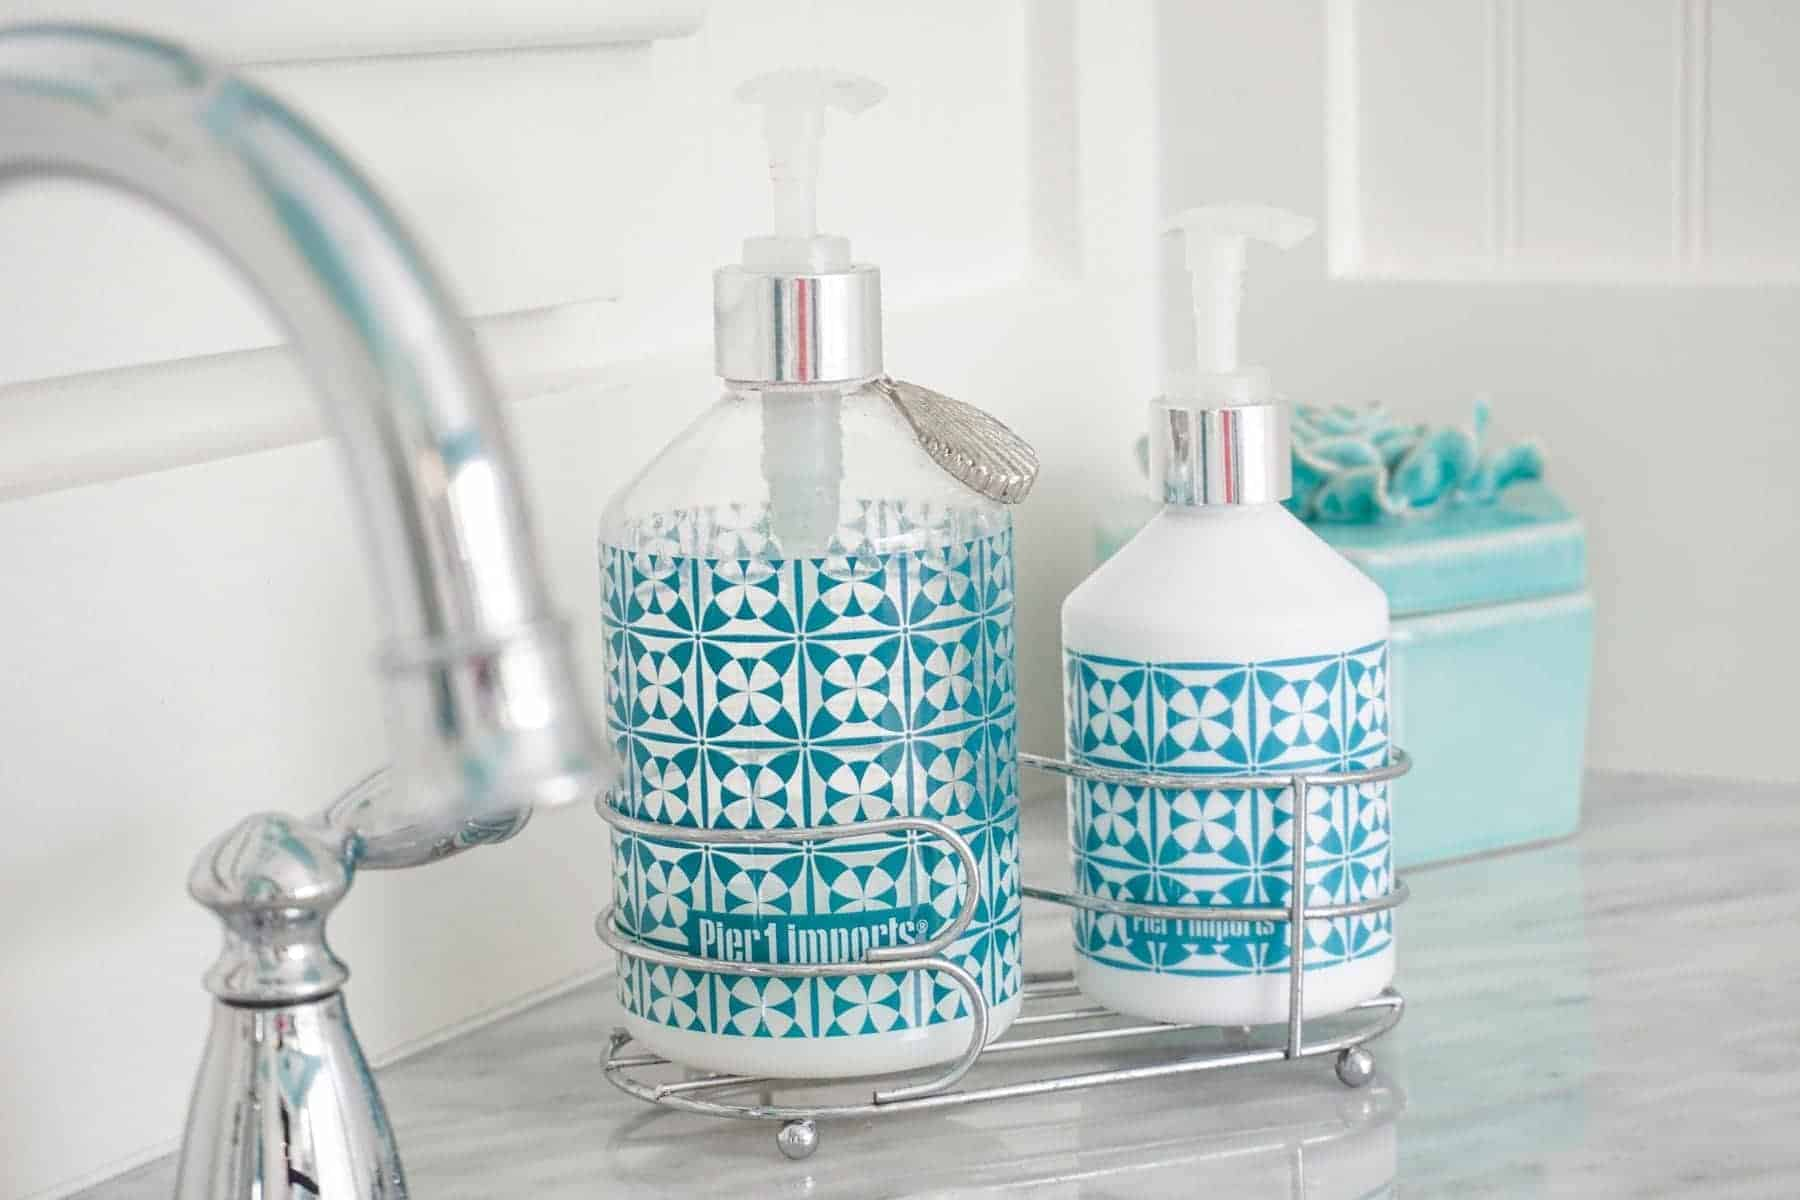 Use liquid soap instead of bar soap